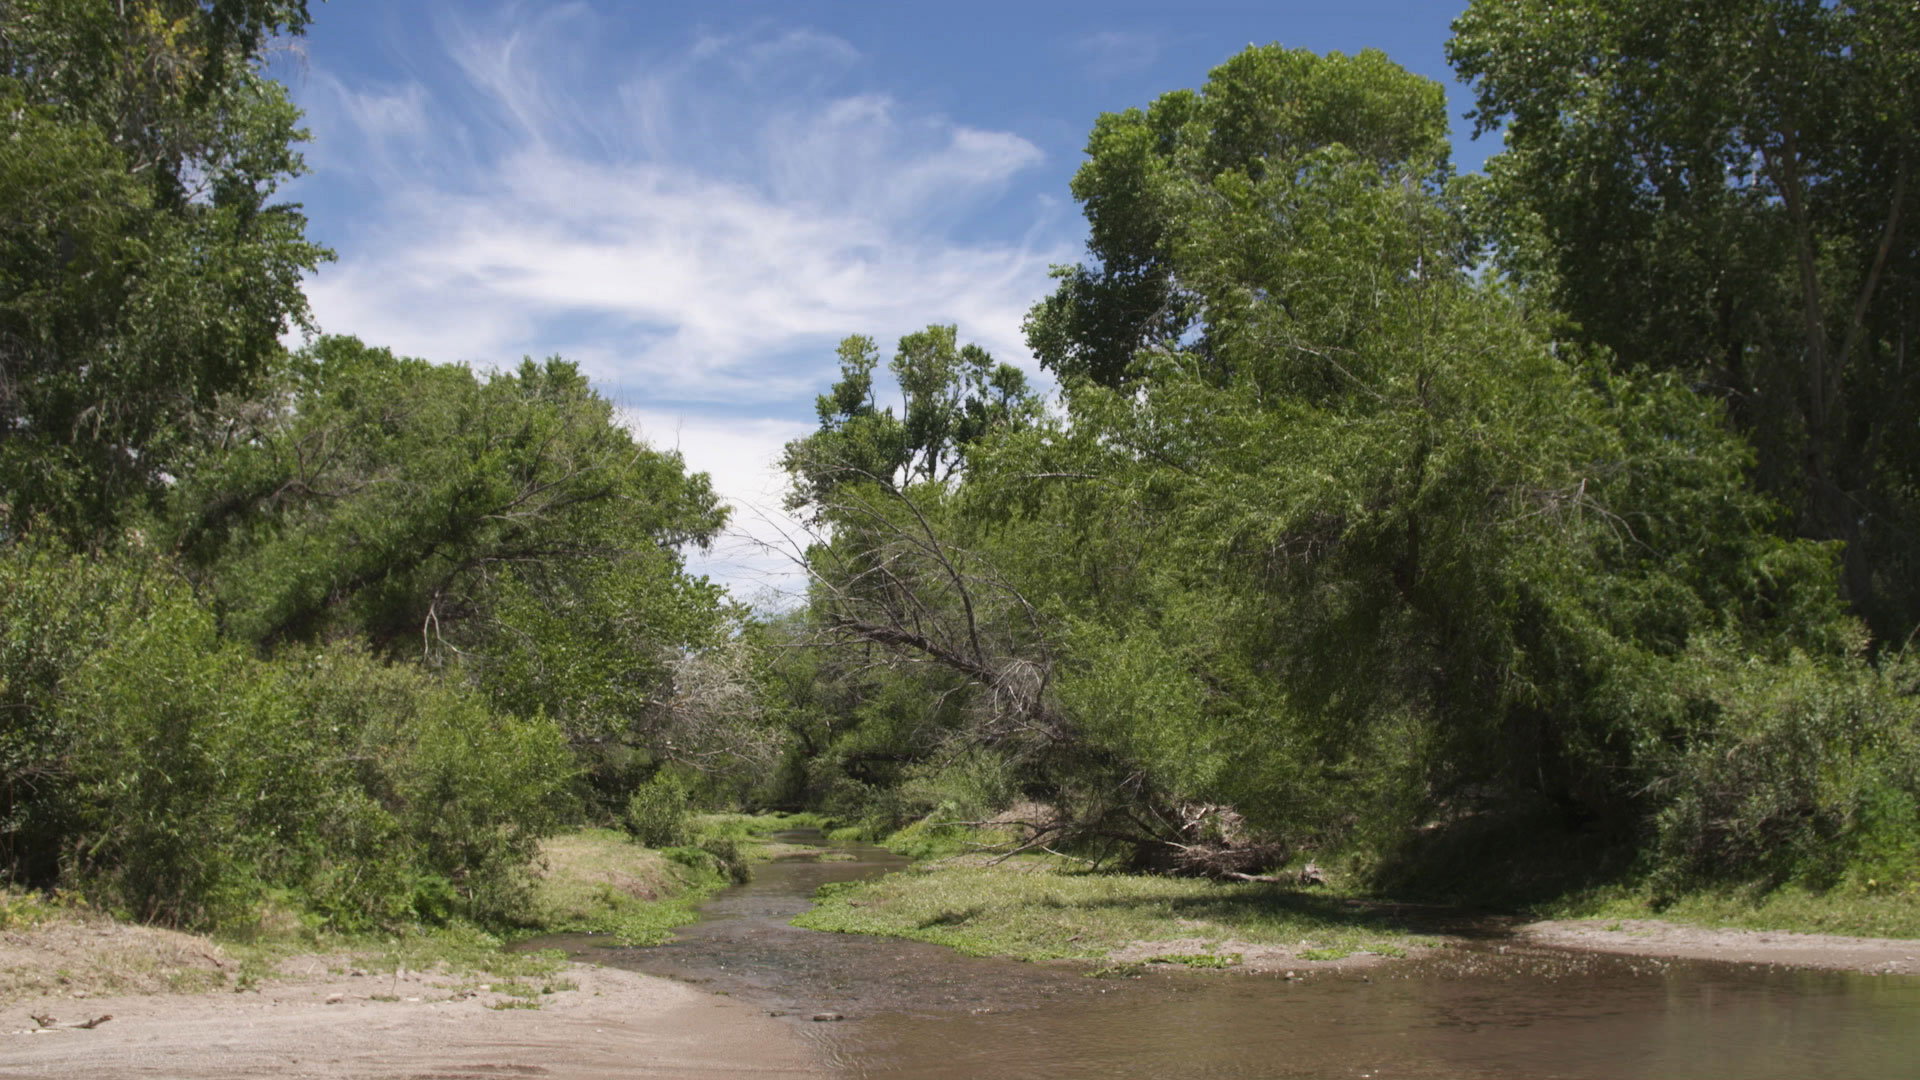 Gila topminnow river